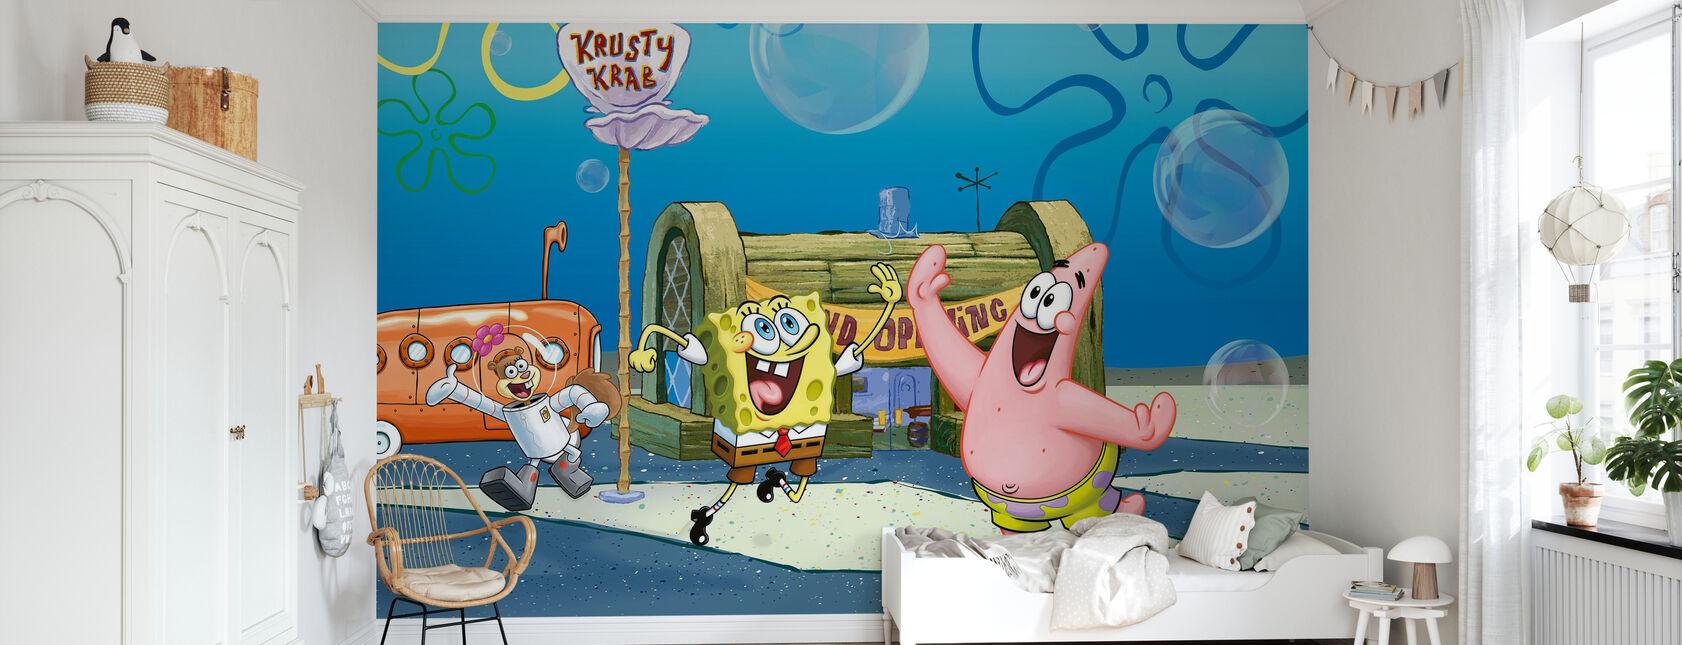 Sponge Bob - Grand Opening at the Krusty Krab - Wallpaper - Kids Room